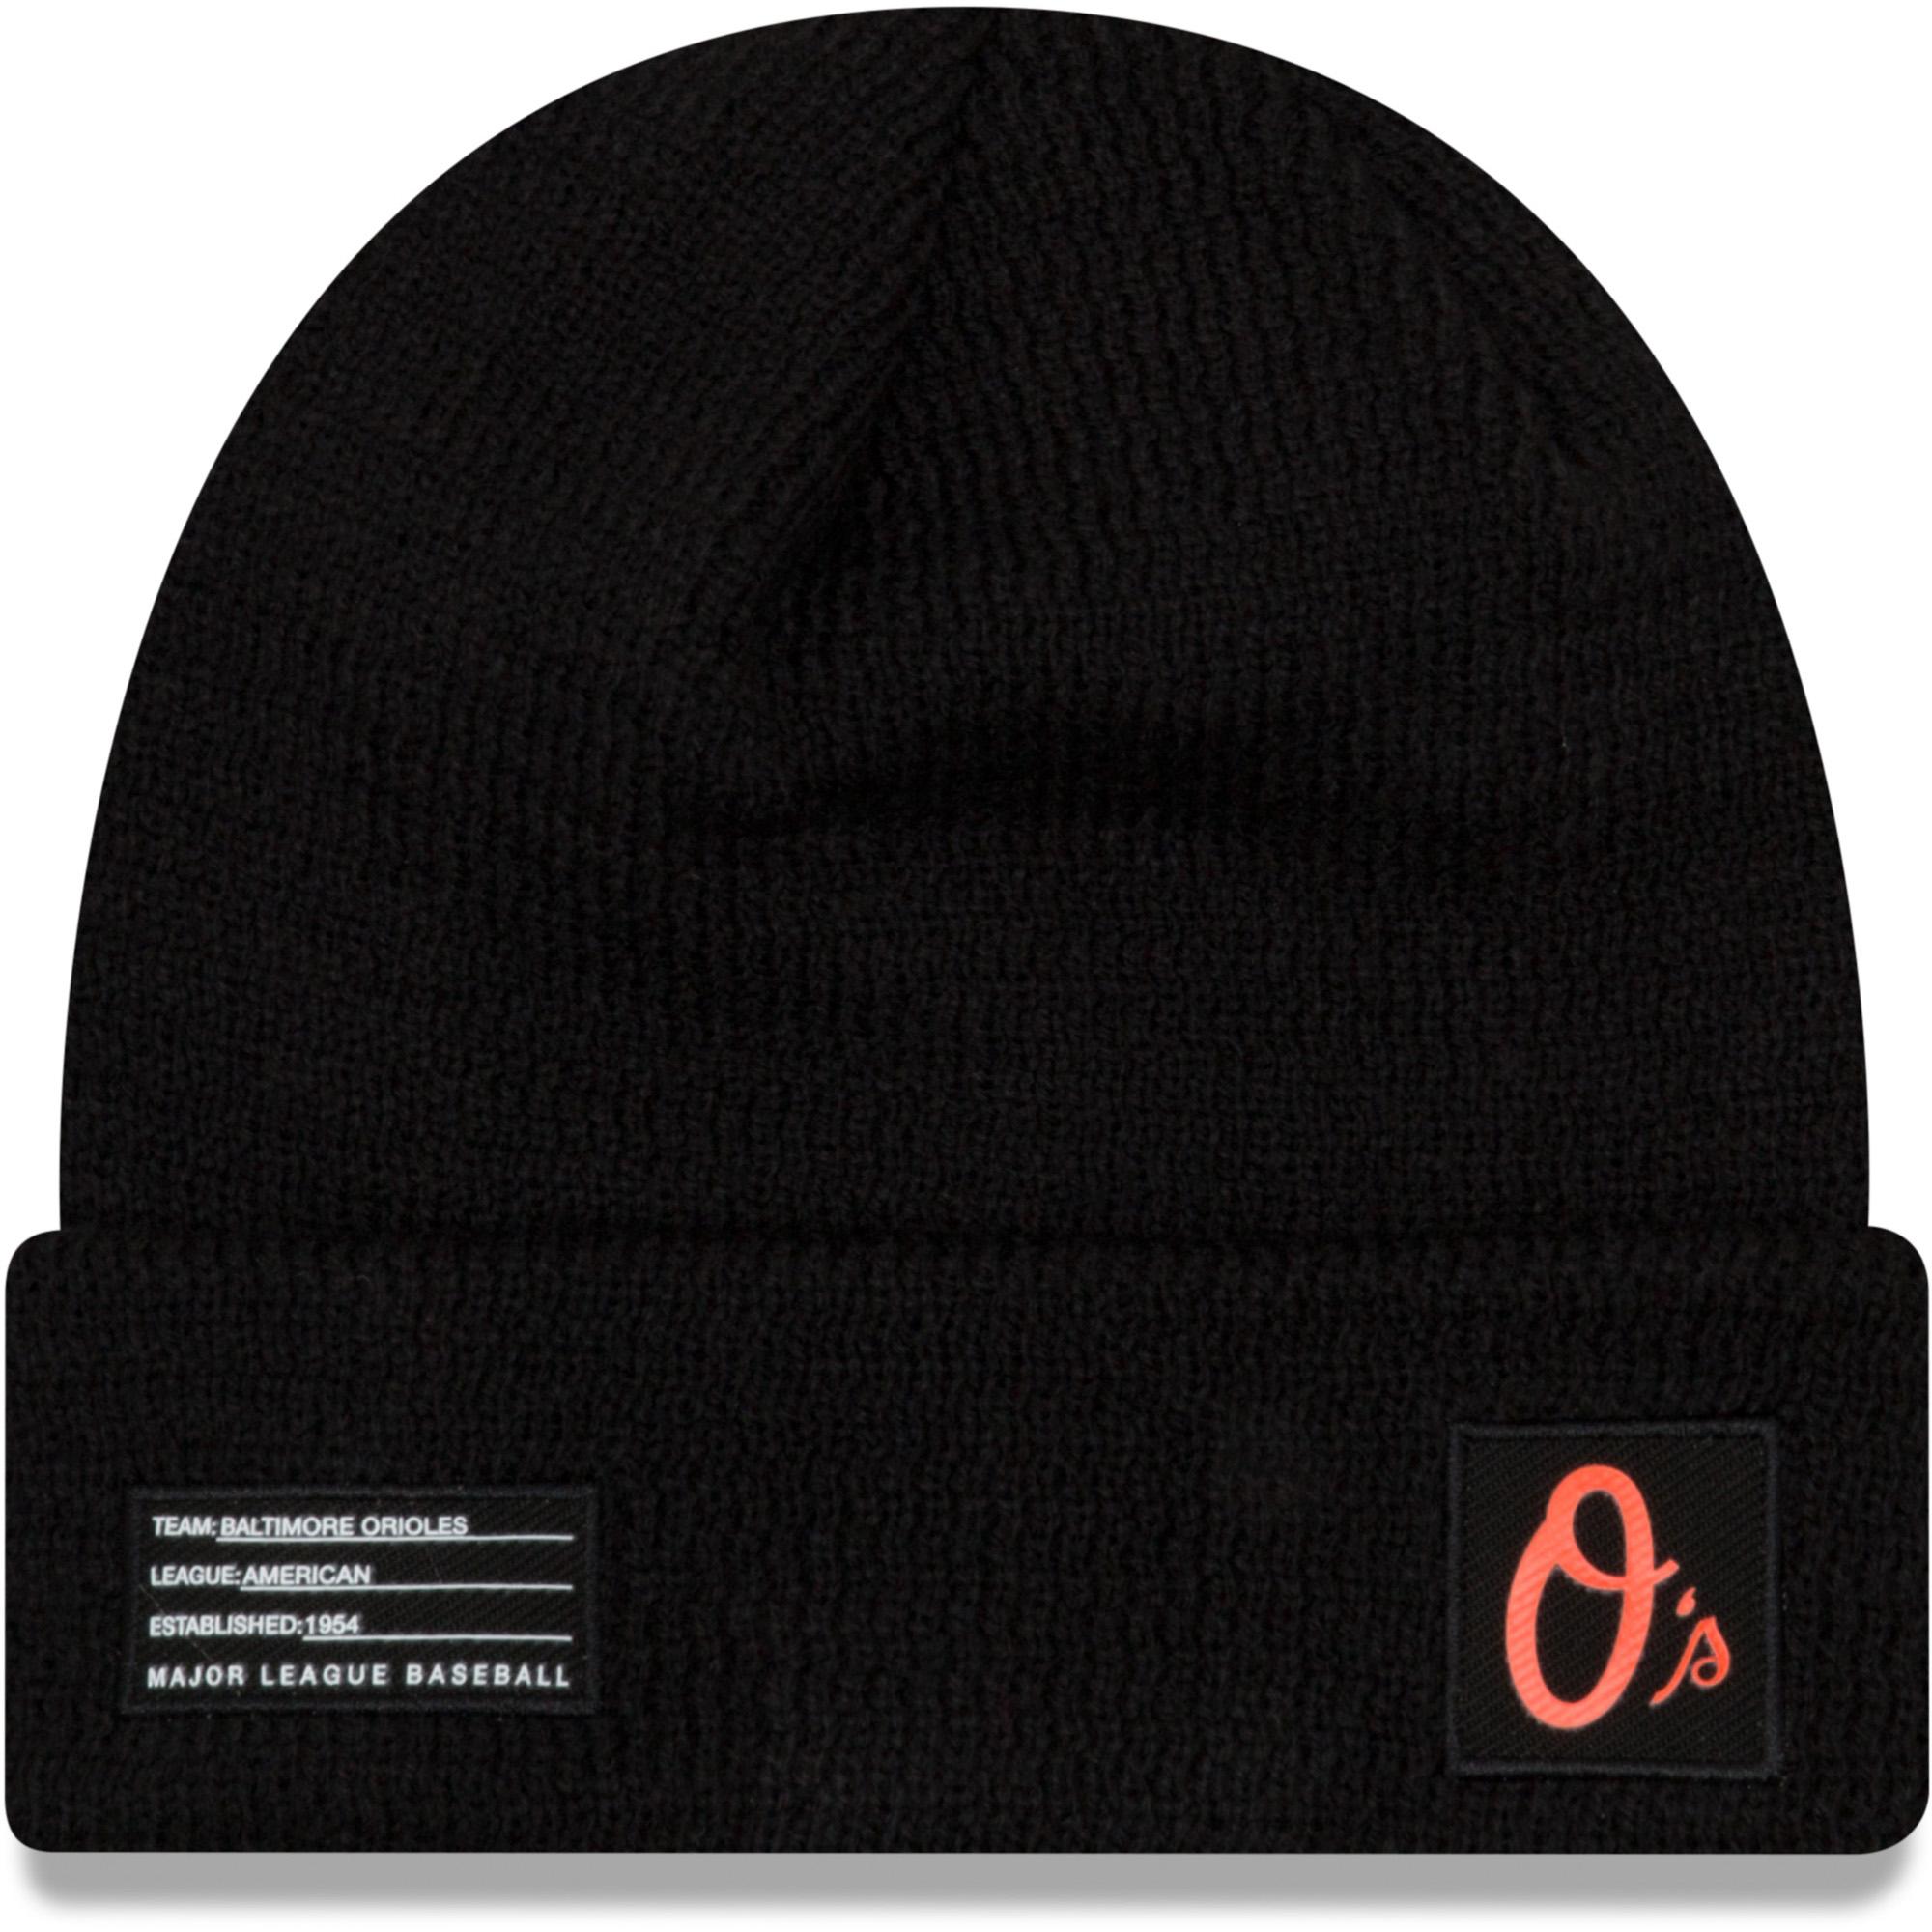 Baltimore Orioles New Era Youth On-Field Sport Cuffed Knit Hat - Black - OSFA